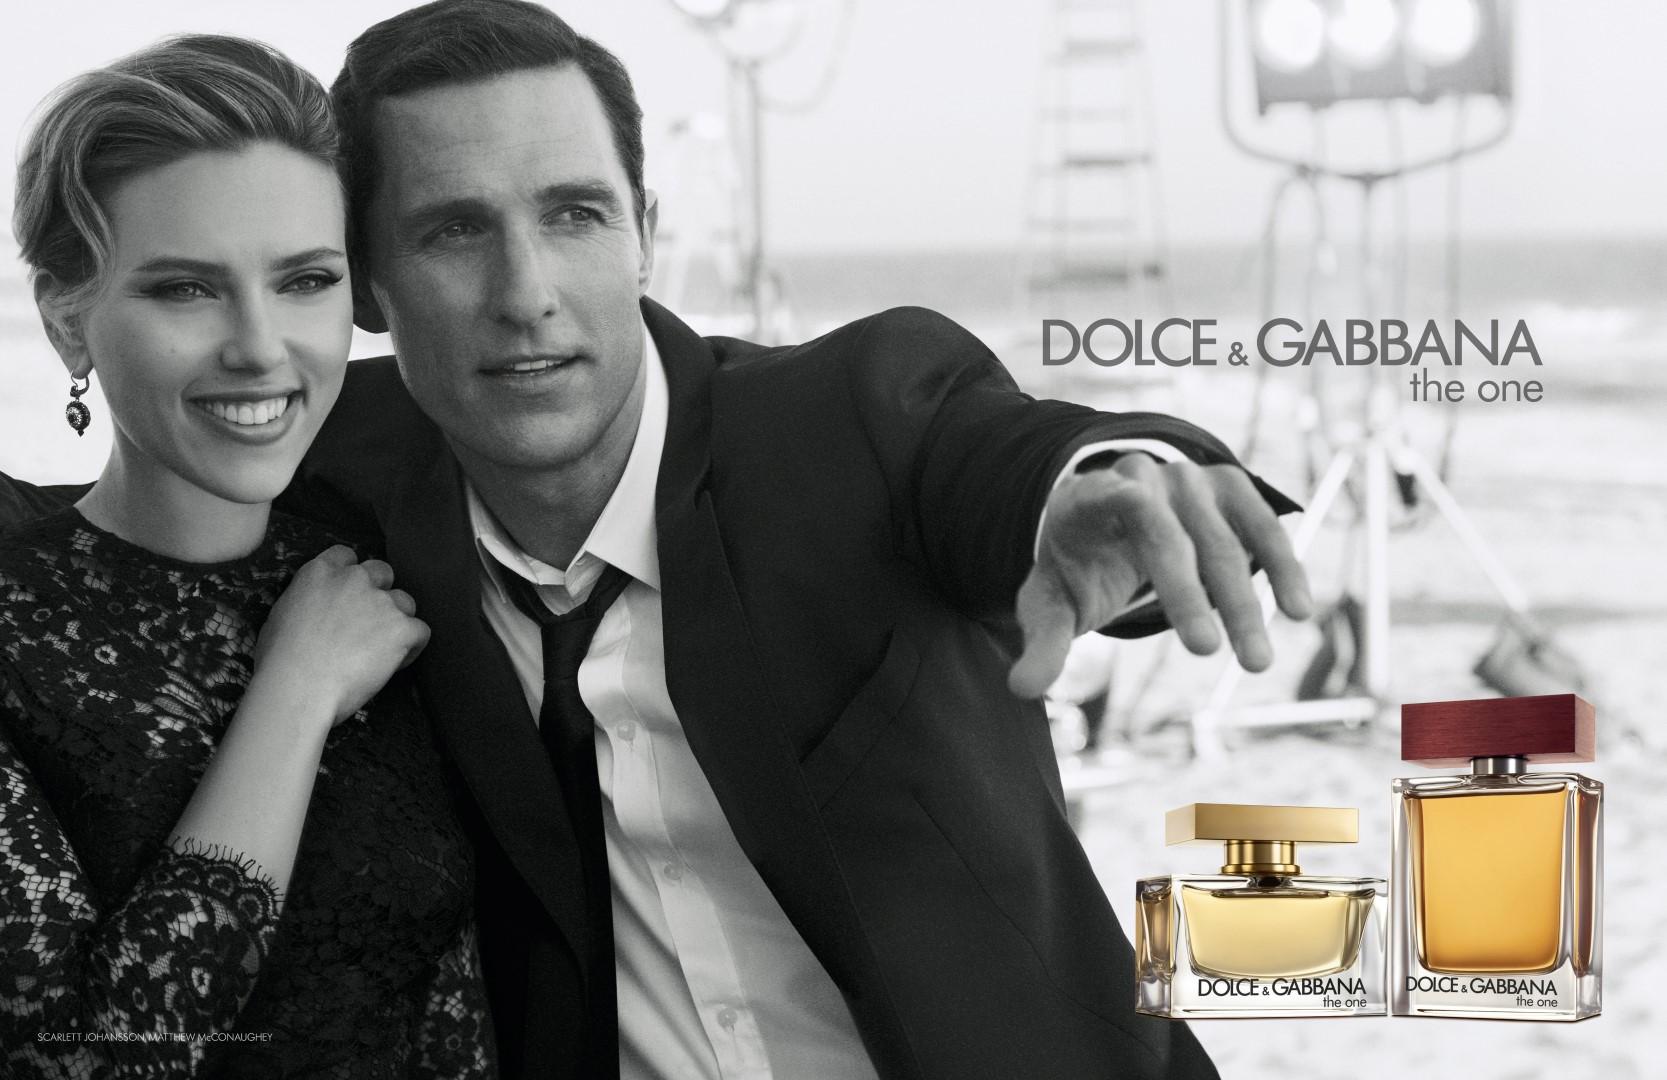 GabbanaThe Dolceamp; GabbanaThe OneB OneB Blonde Blonde As Dolceamp; As Dolceamp; zVqSUpGM